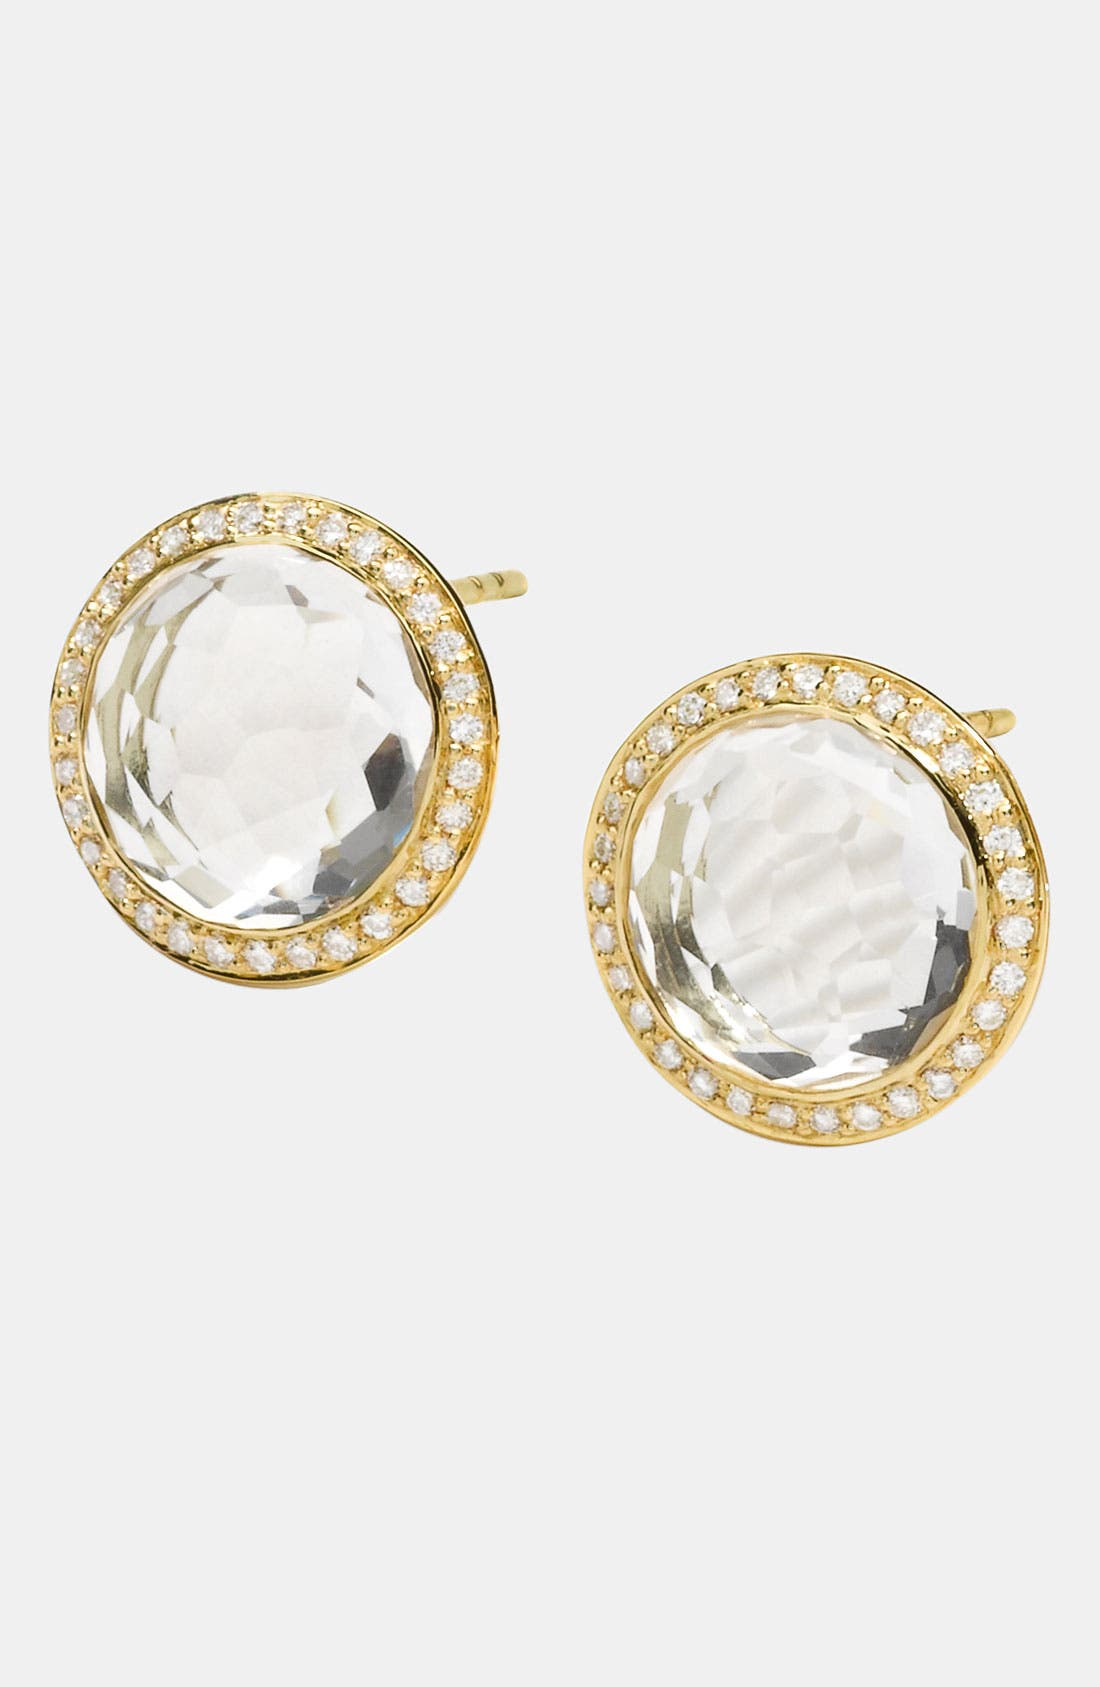 Main Image - Ippolita 'Lollipop' Diamond & 18k Gold Earrings